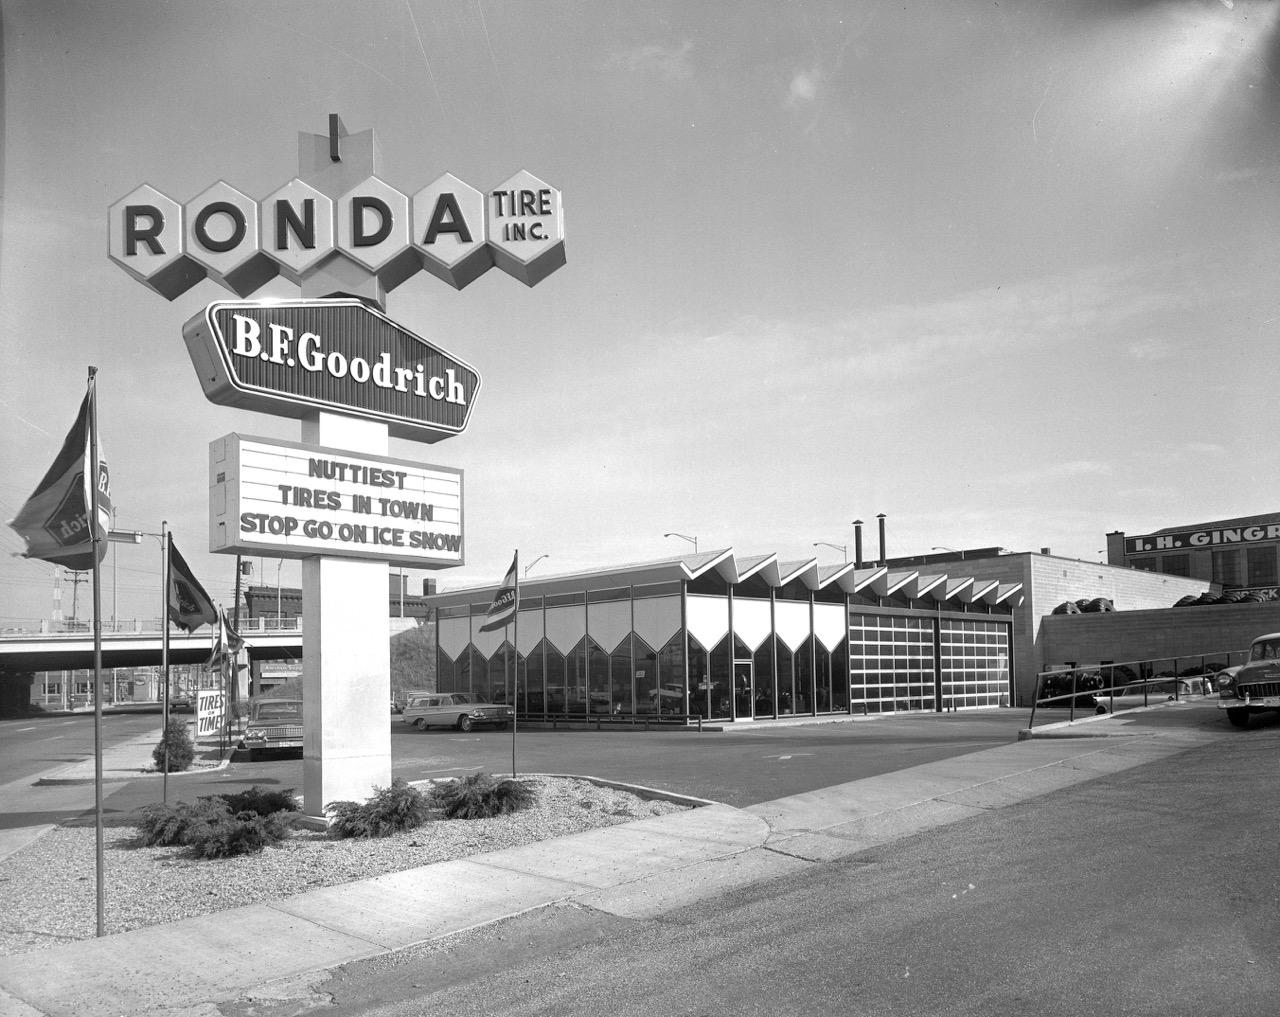 1957 RONDA TIRE BUILDING, GRAND RAPIDS